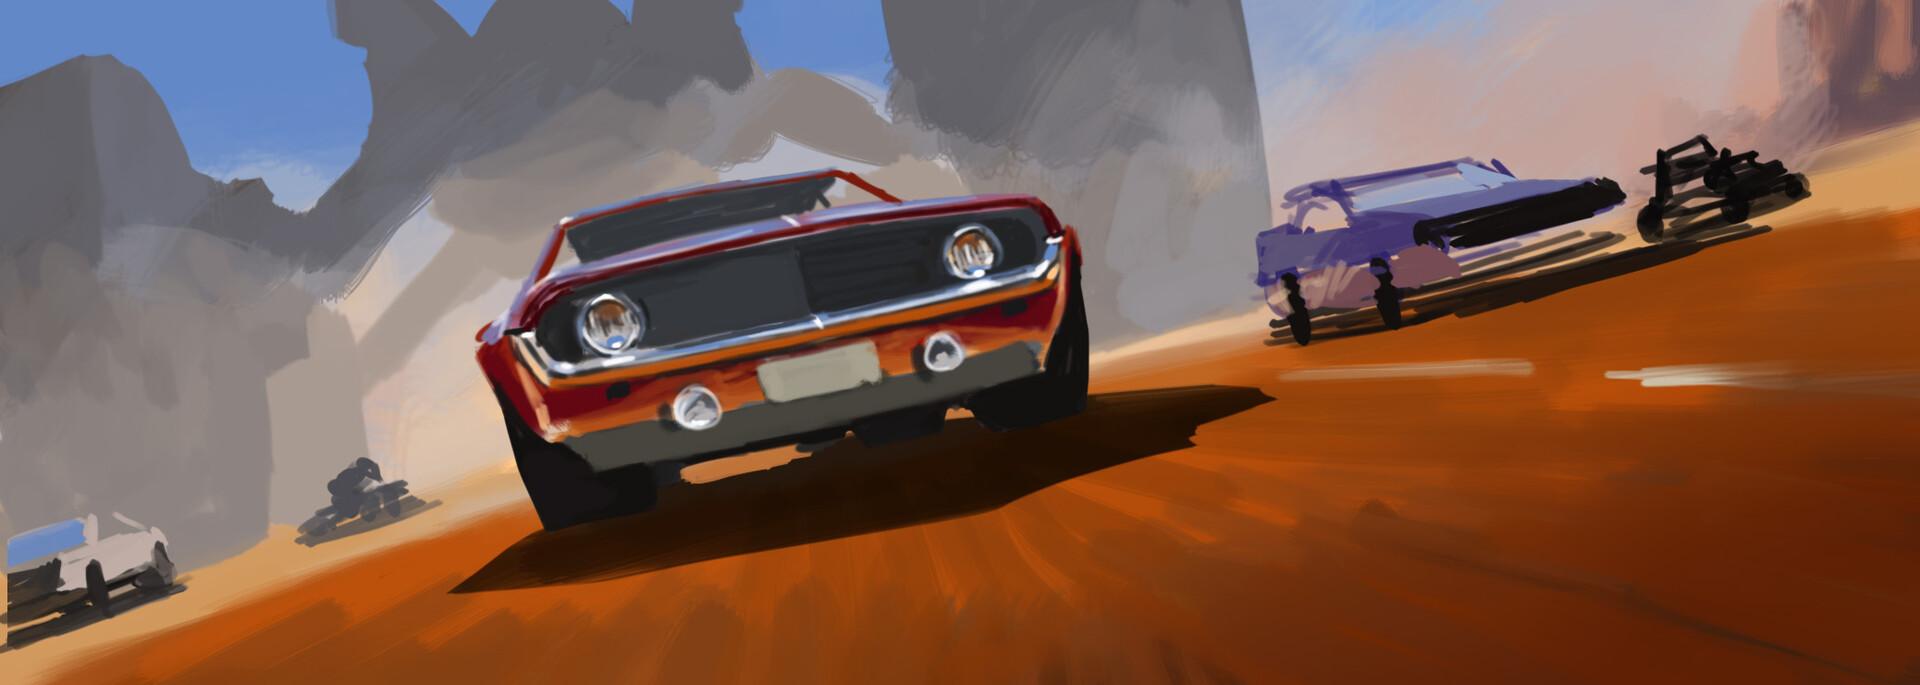 Phil saunders desert chase sketch